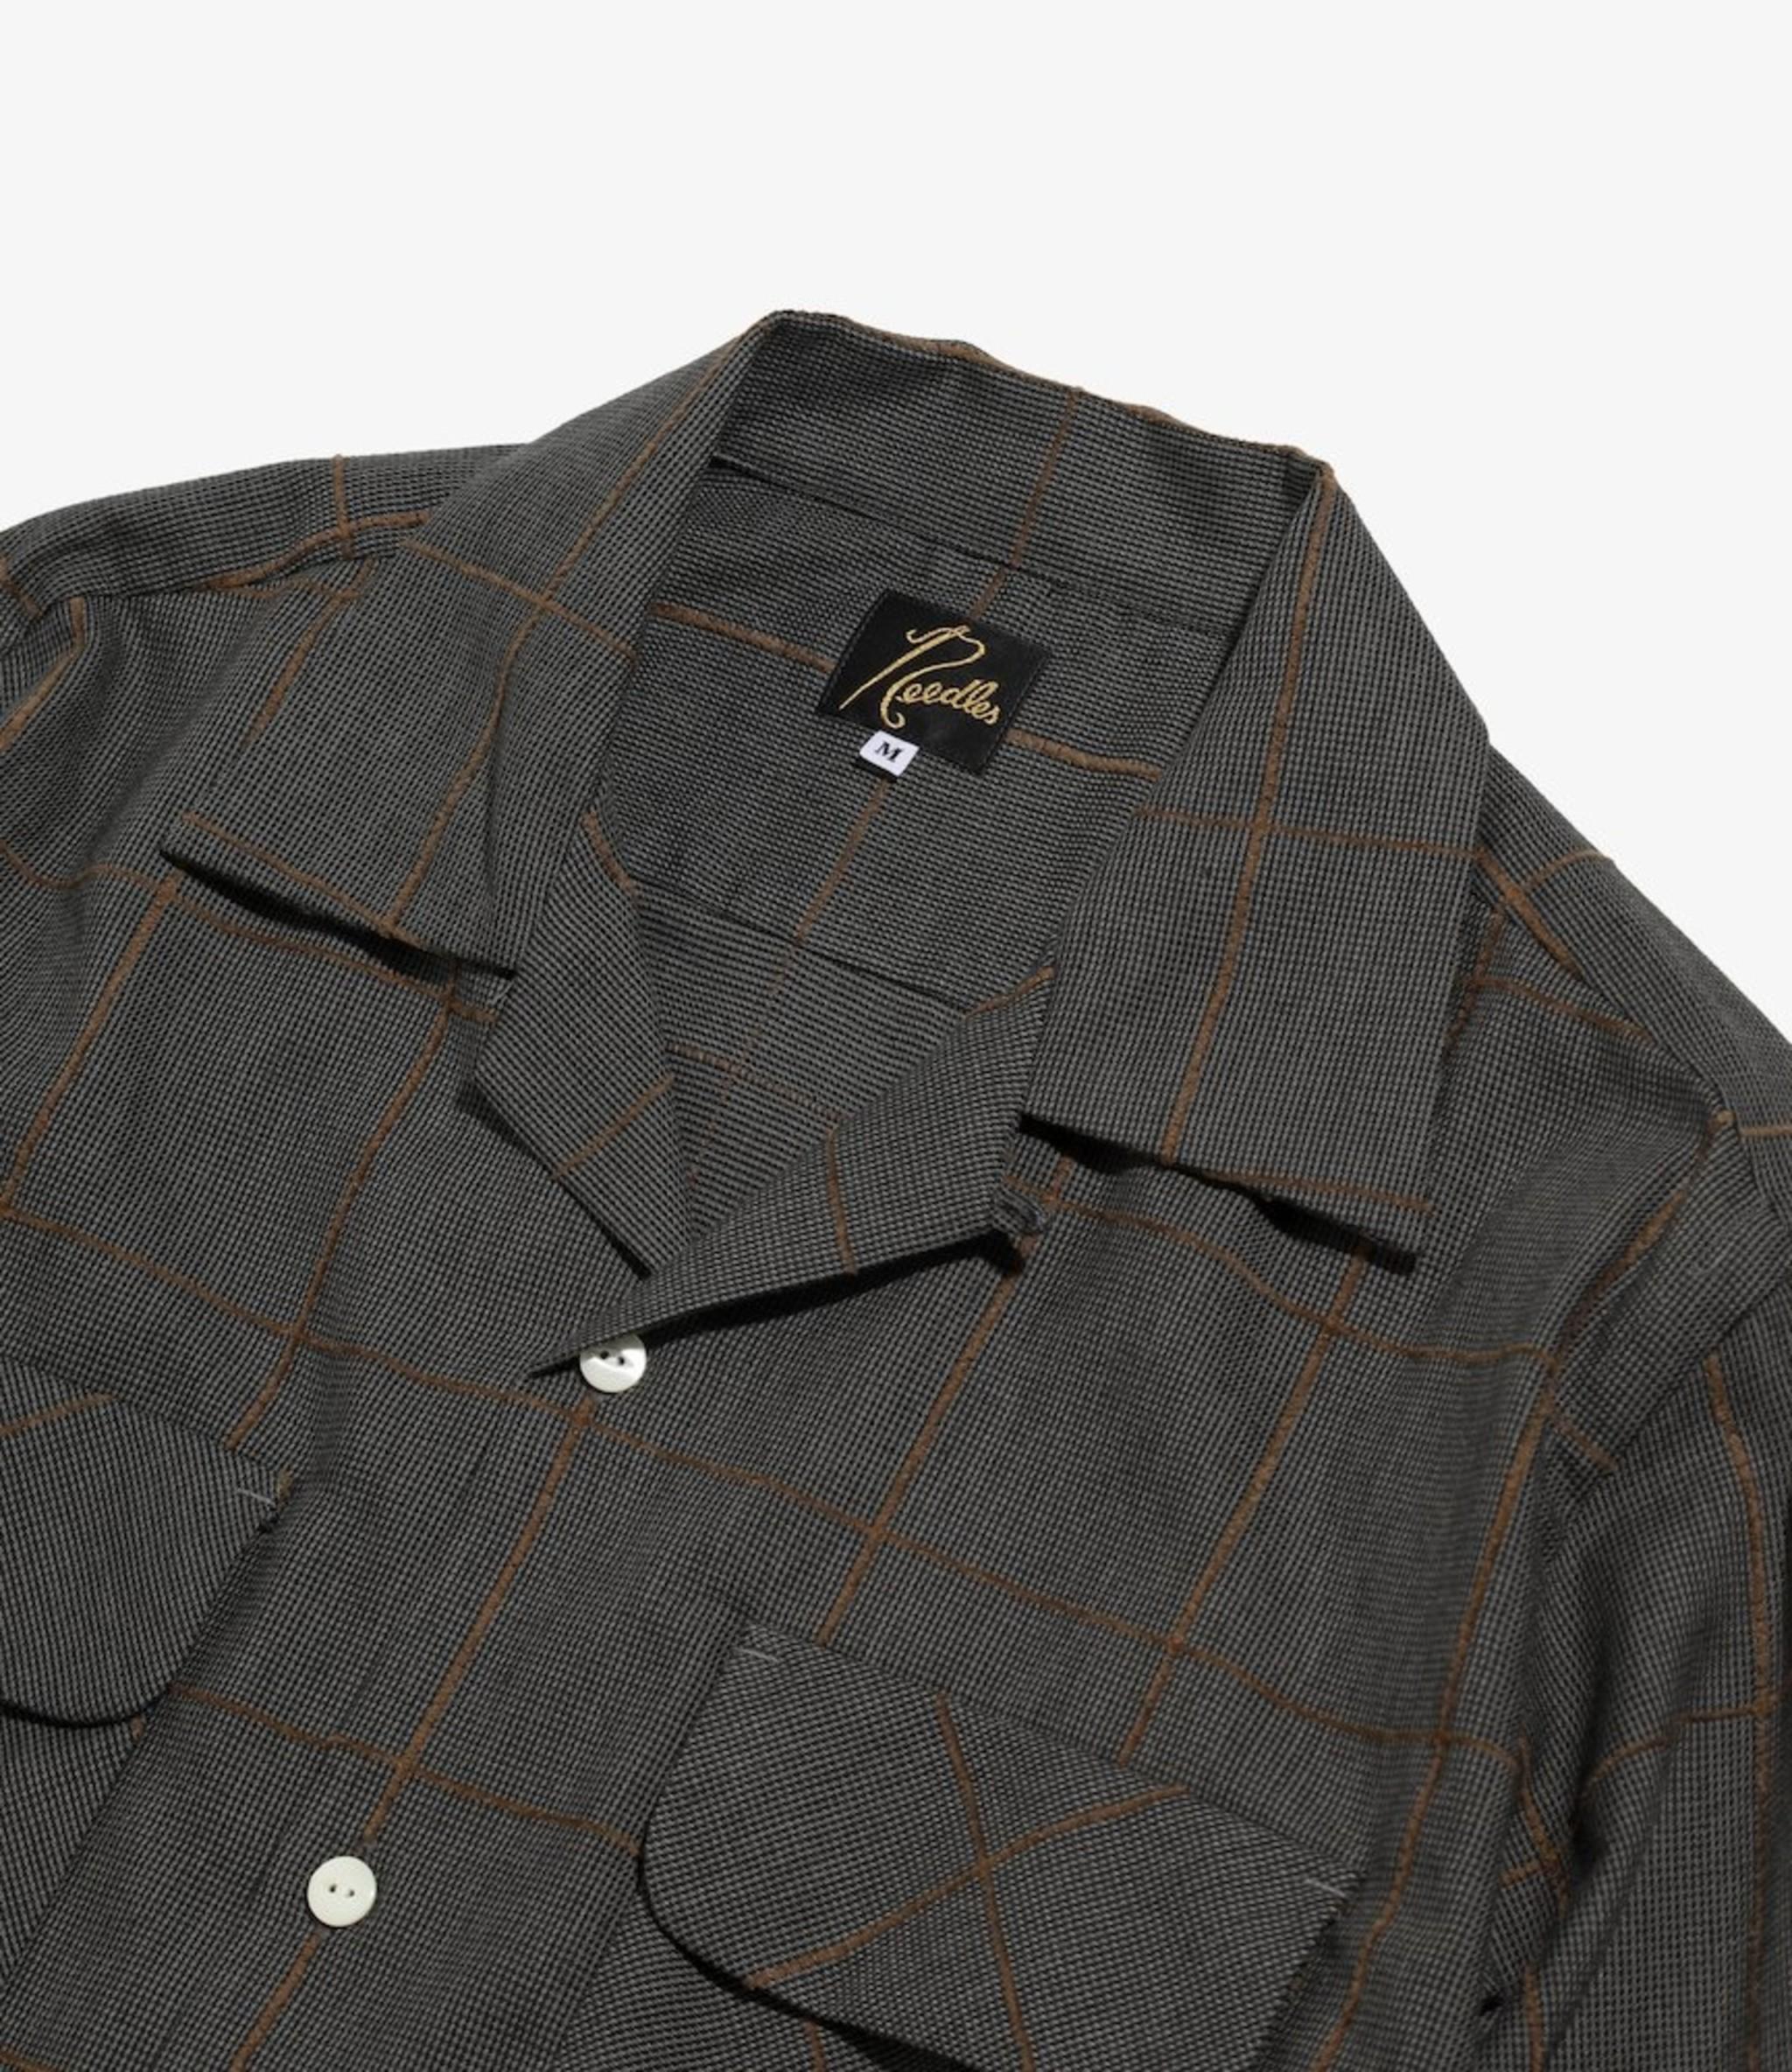 Needles C.O.B. Classic Shirt -C/Pe/R Plaid Twill - Charcoal